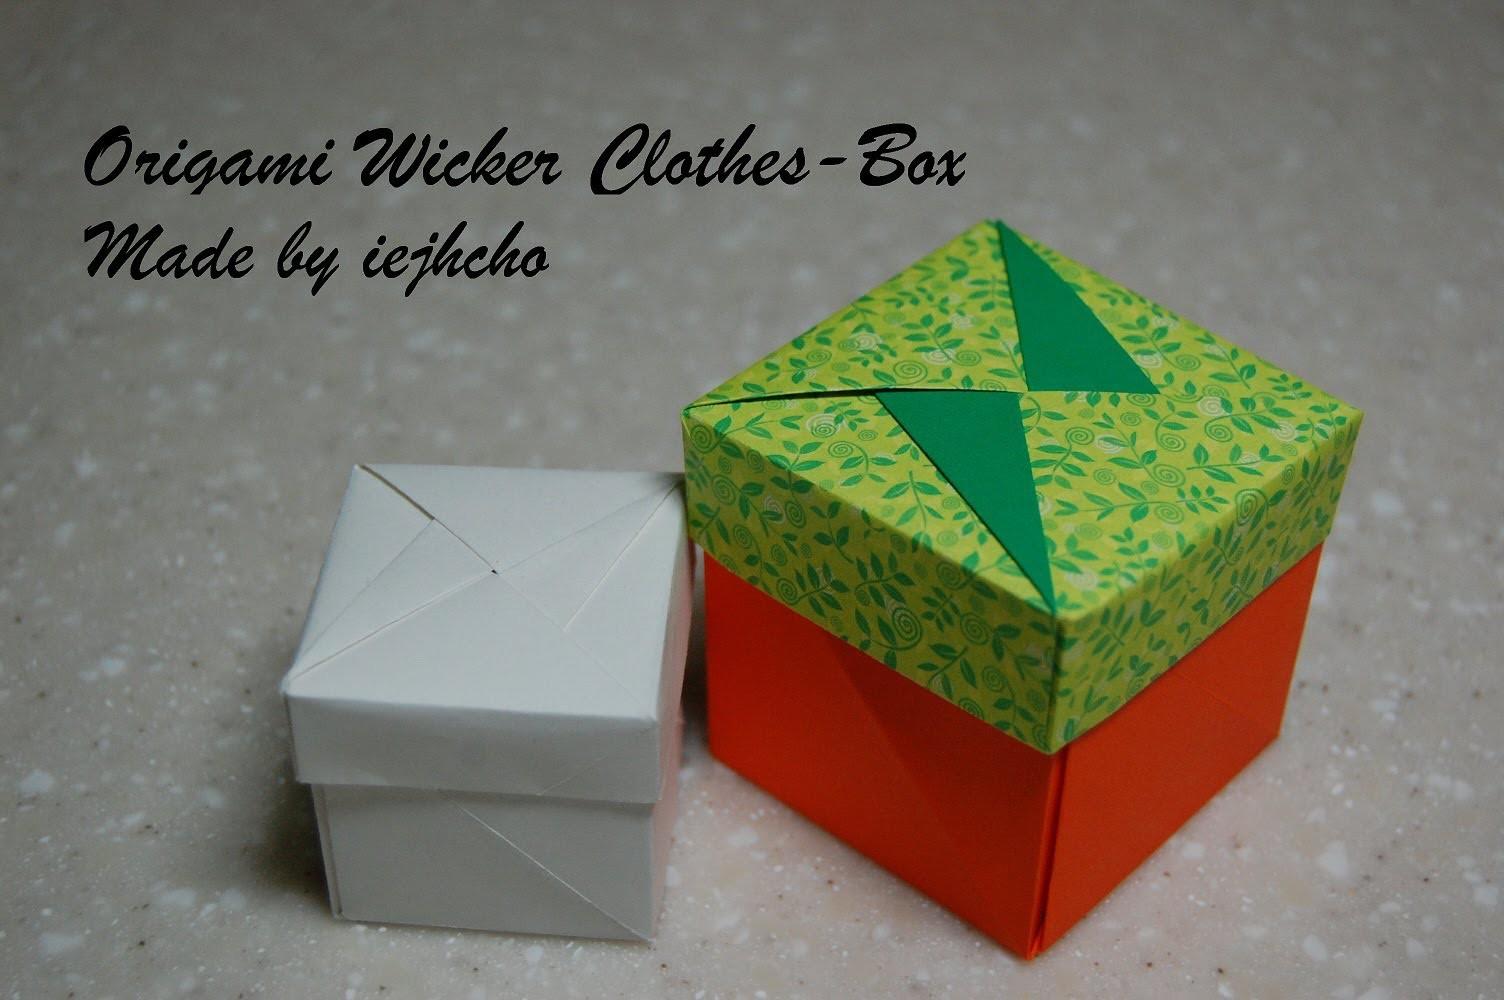 Origami Box(Wicker Clothes Box) Video. 종이접기 상자 접는 방법 동영상